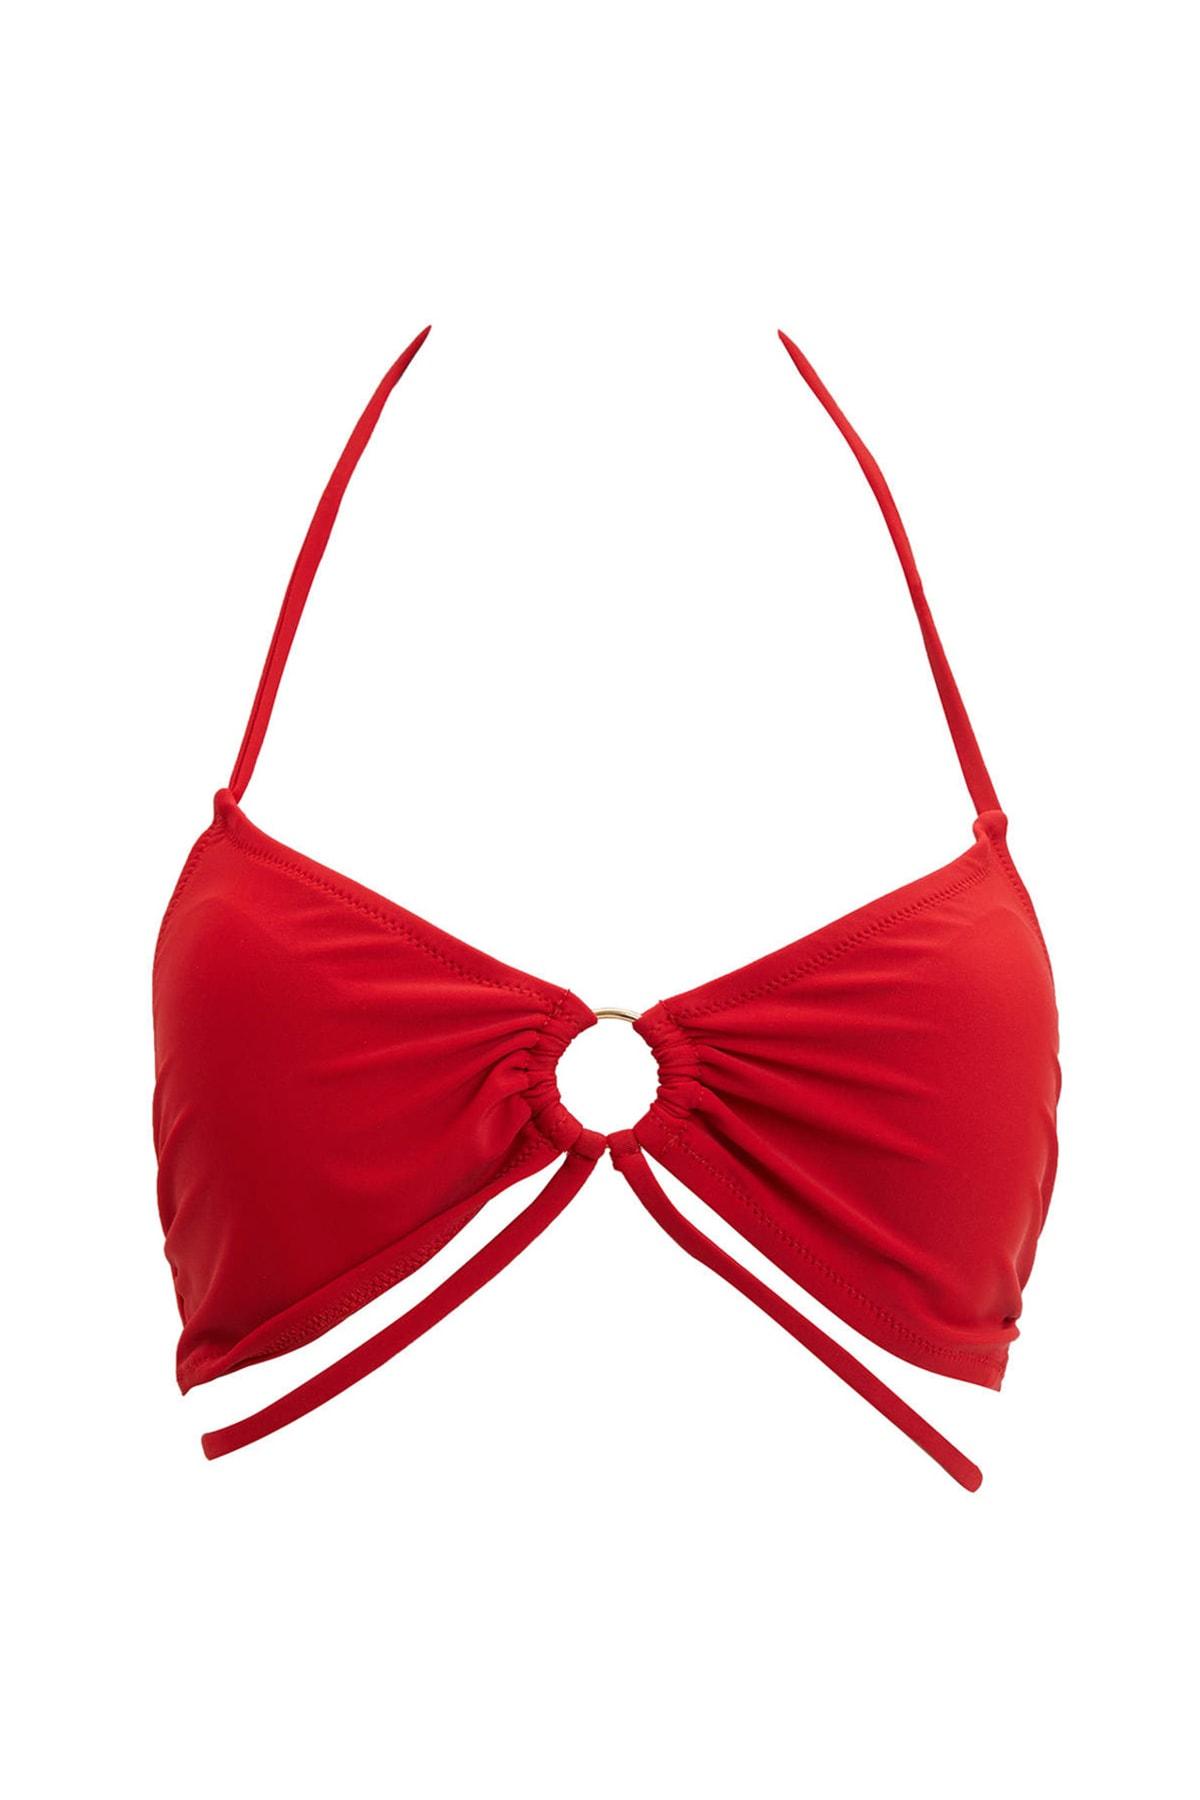 Kadın Kırmızı Boyundan Bağlamalı Bikini Üstü M9818AZ.20SM.RD1